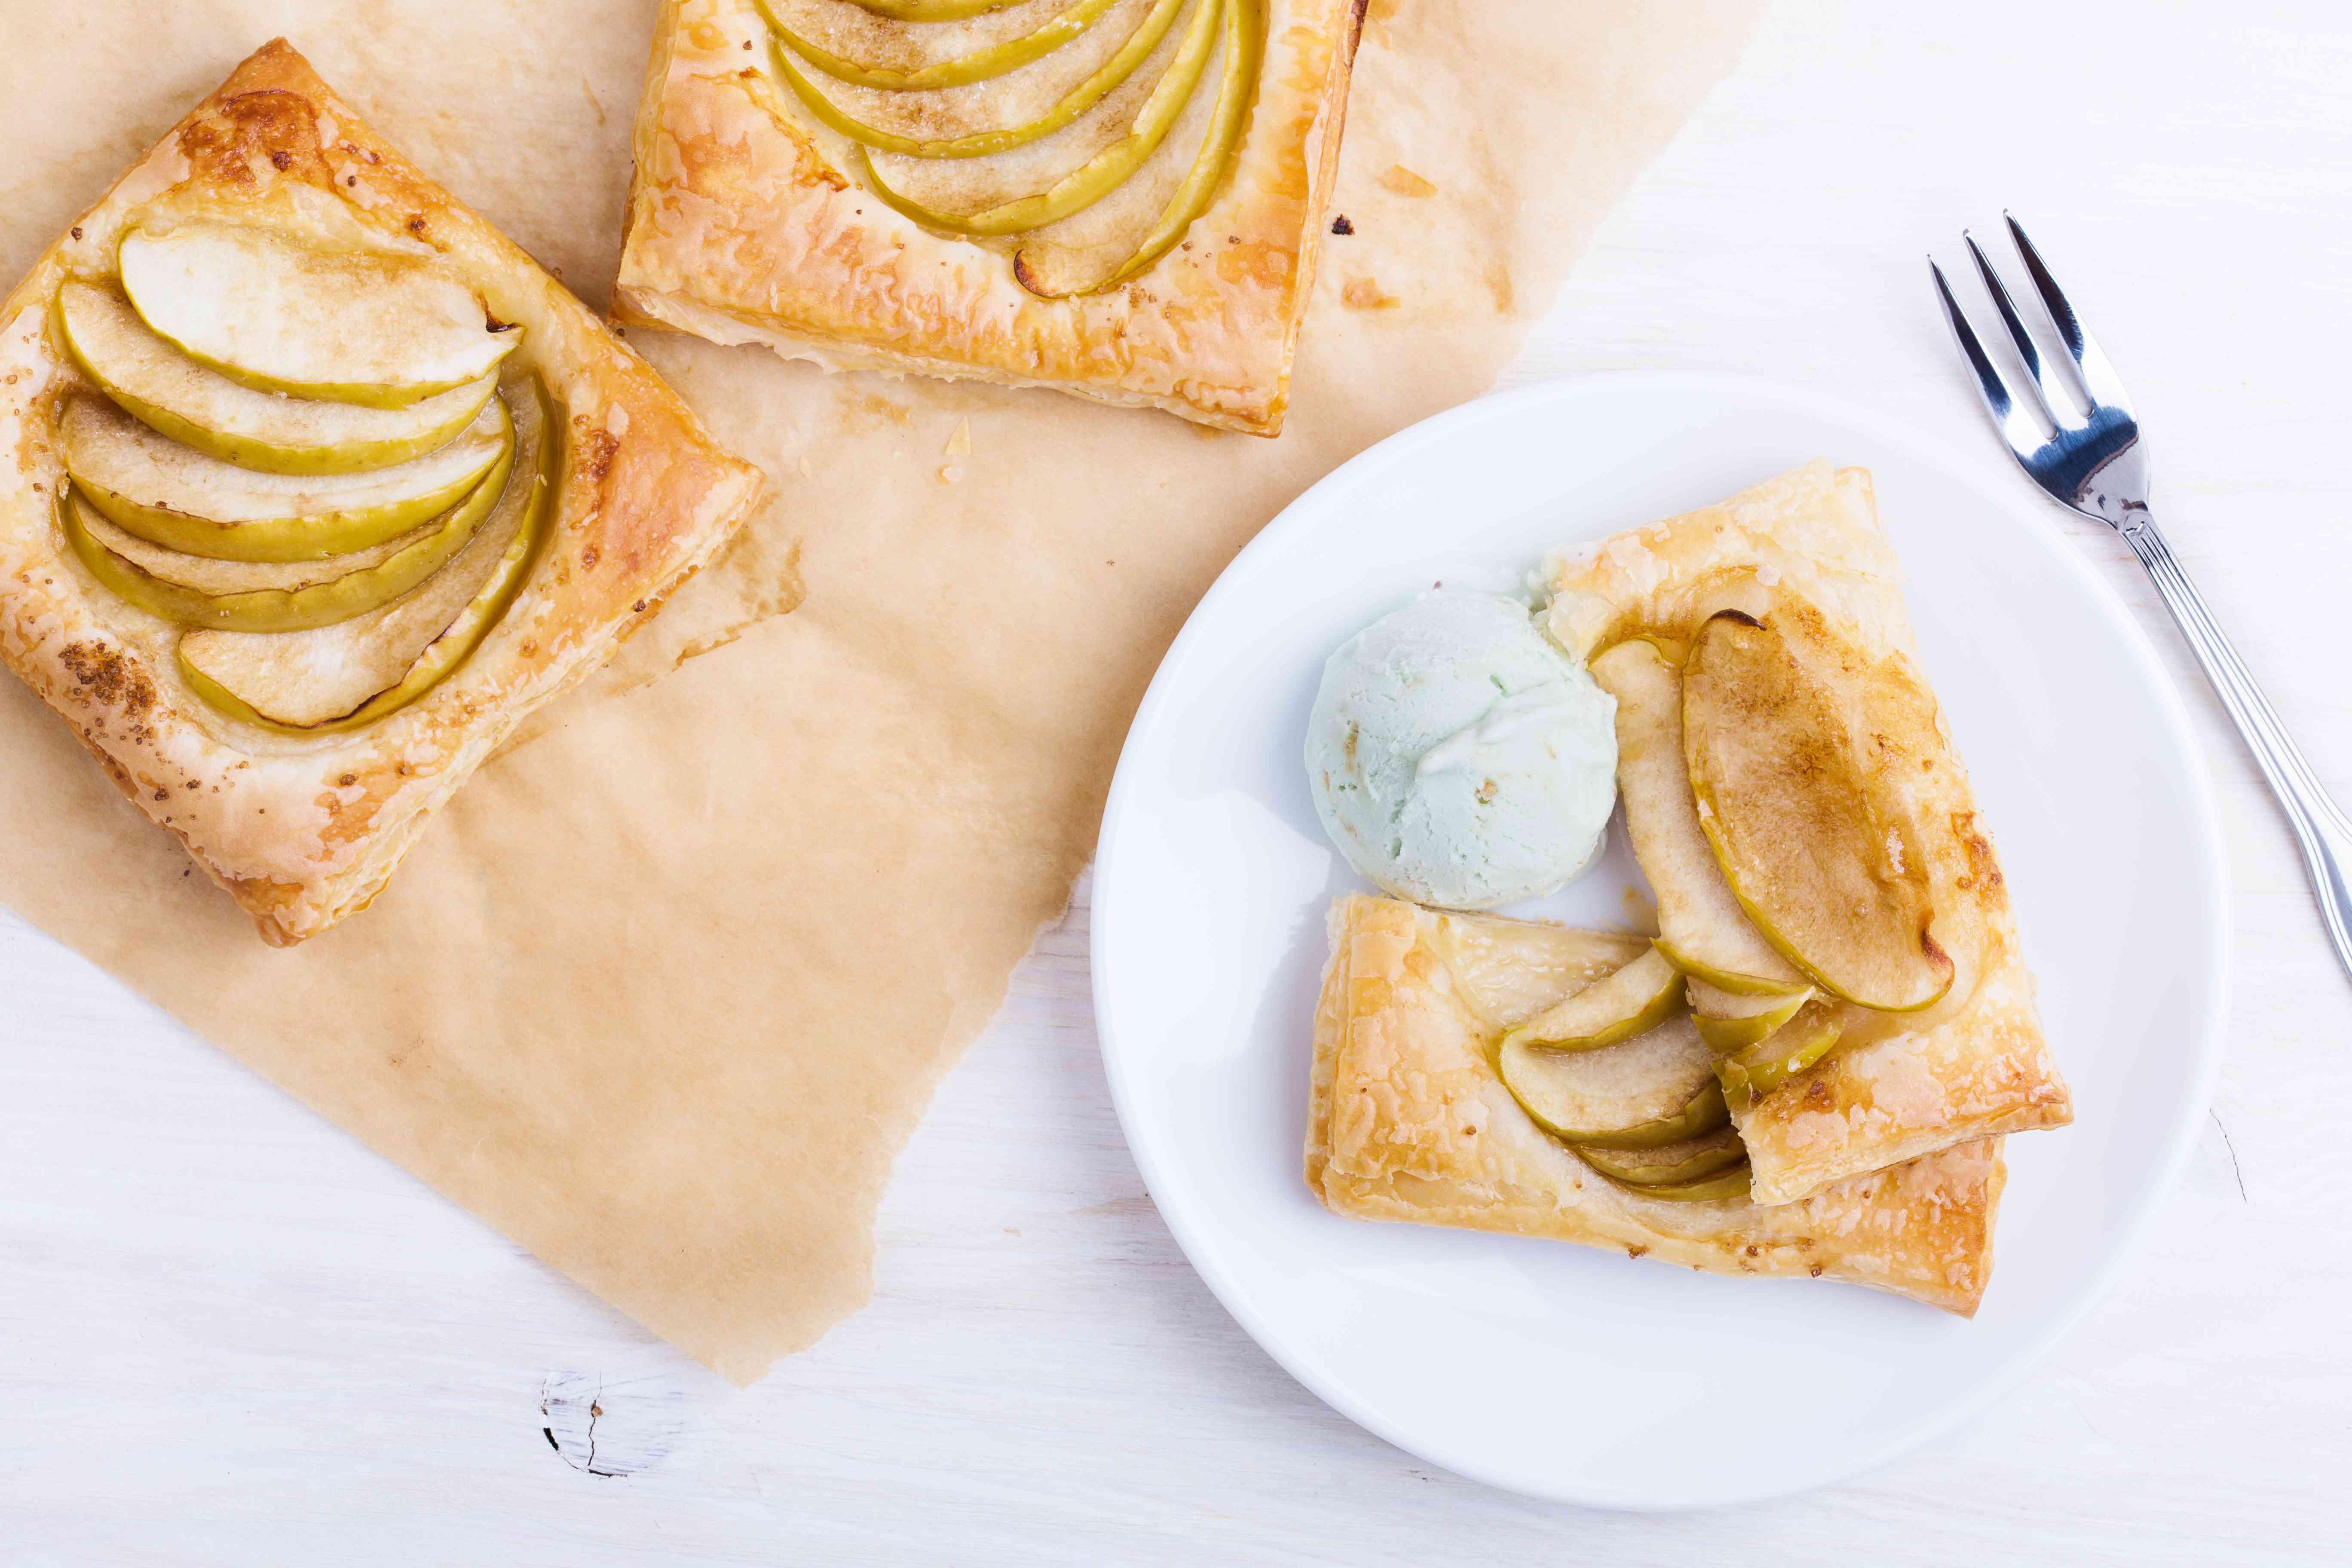 Homemade puffed pastry apple tart with ice cream